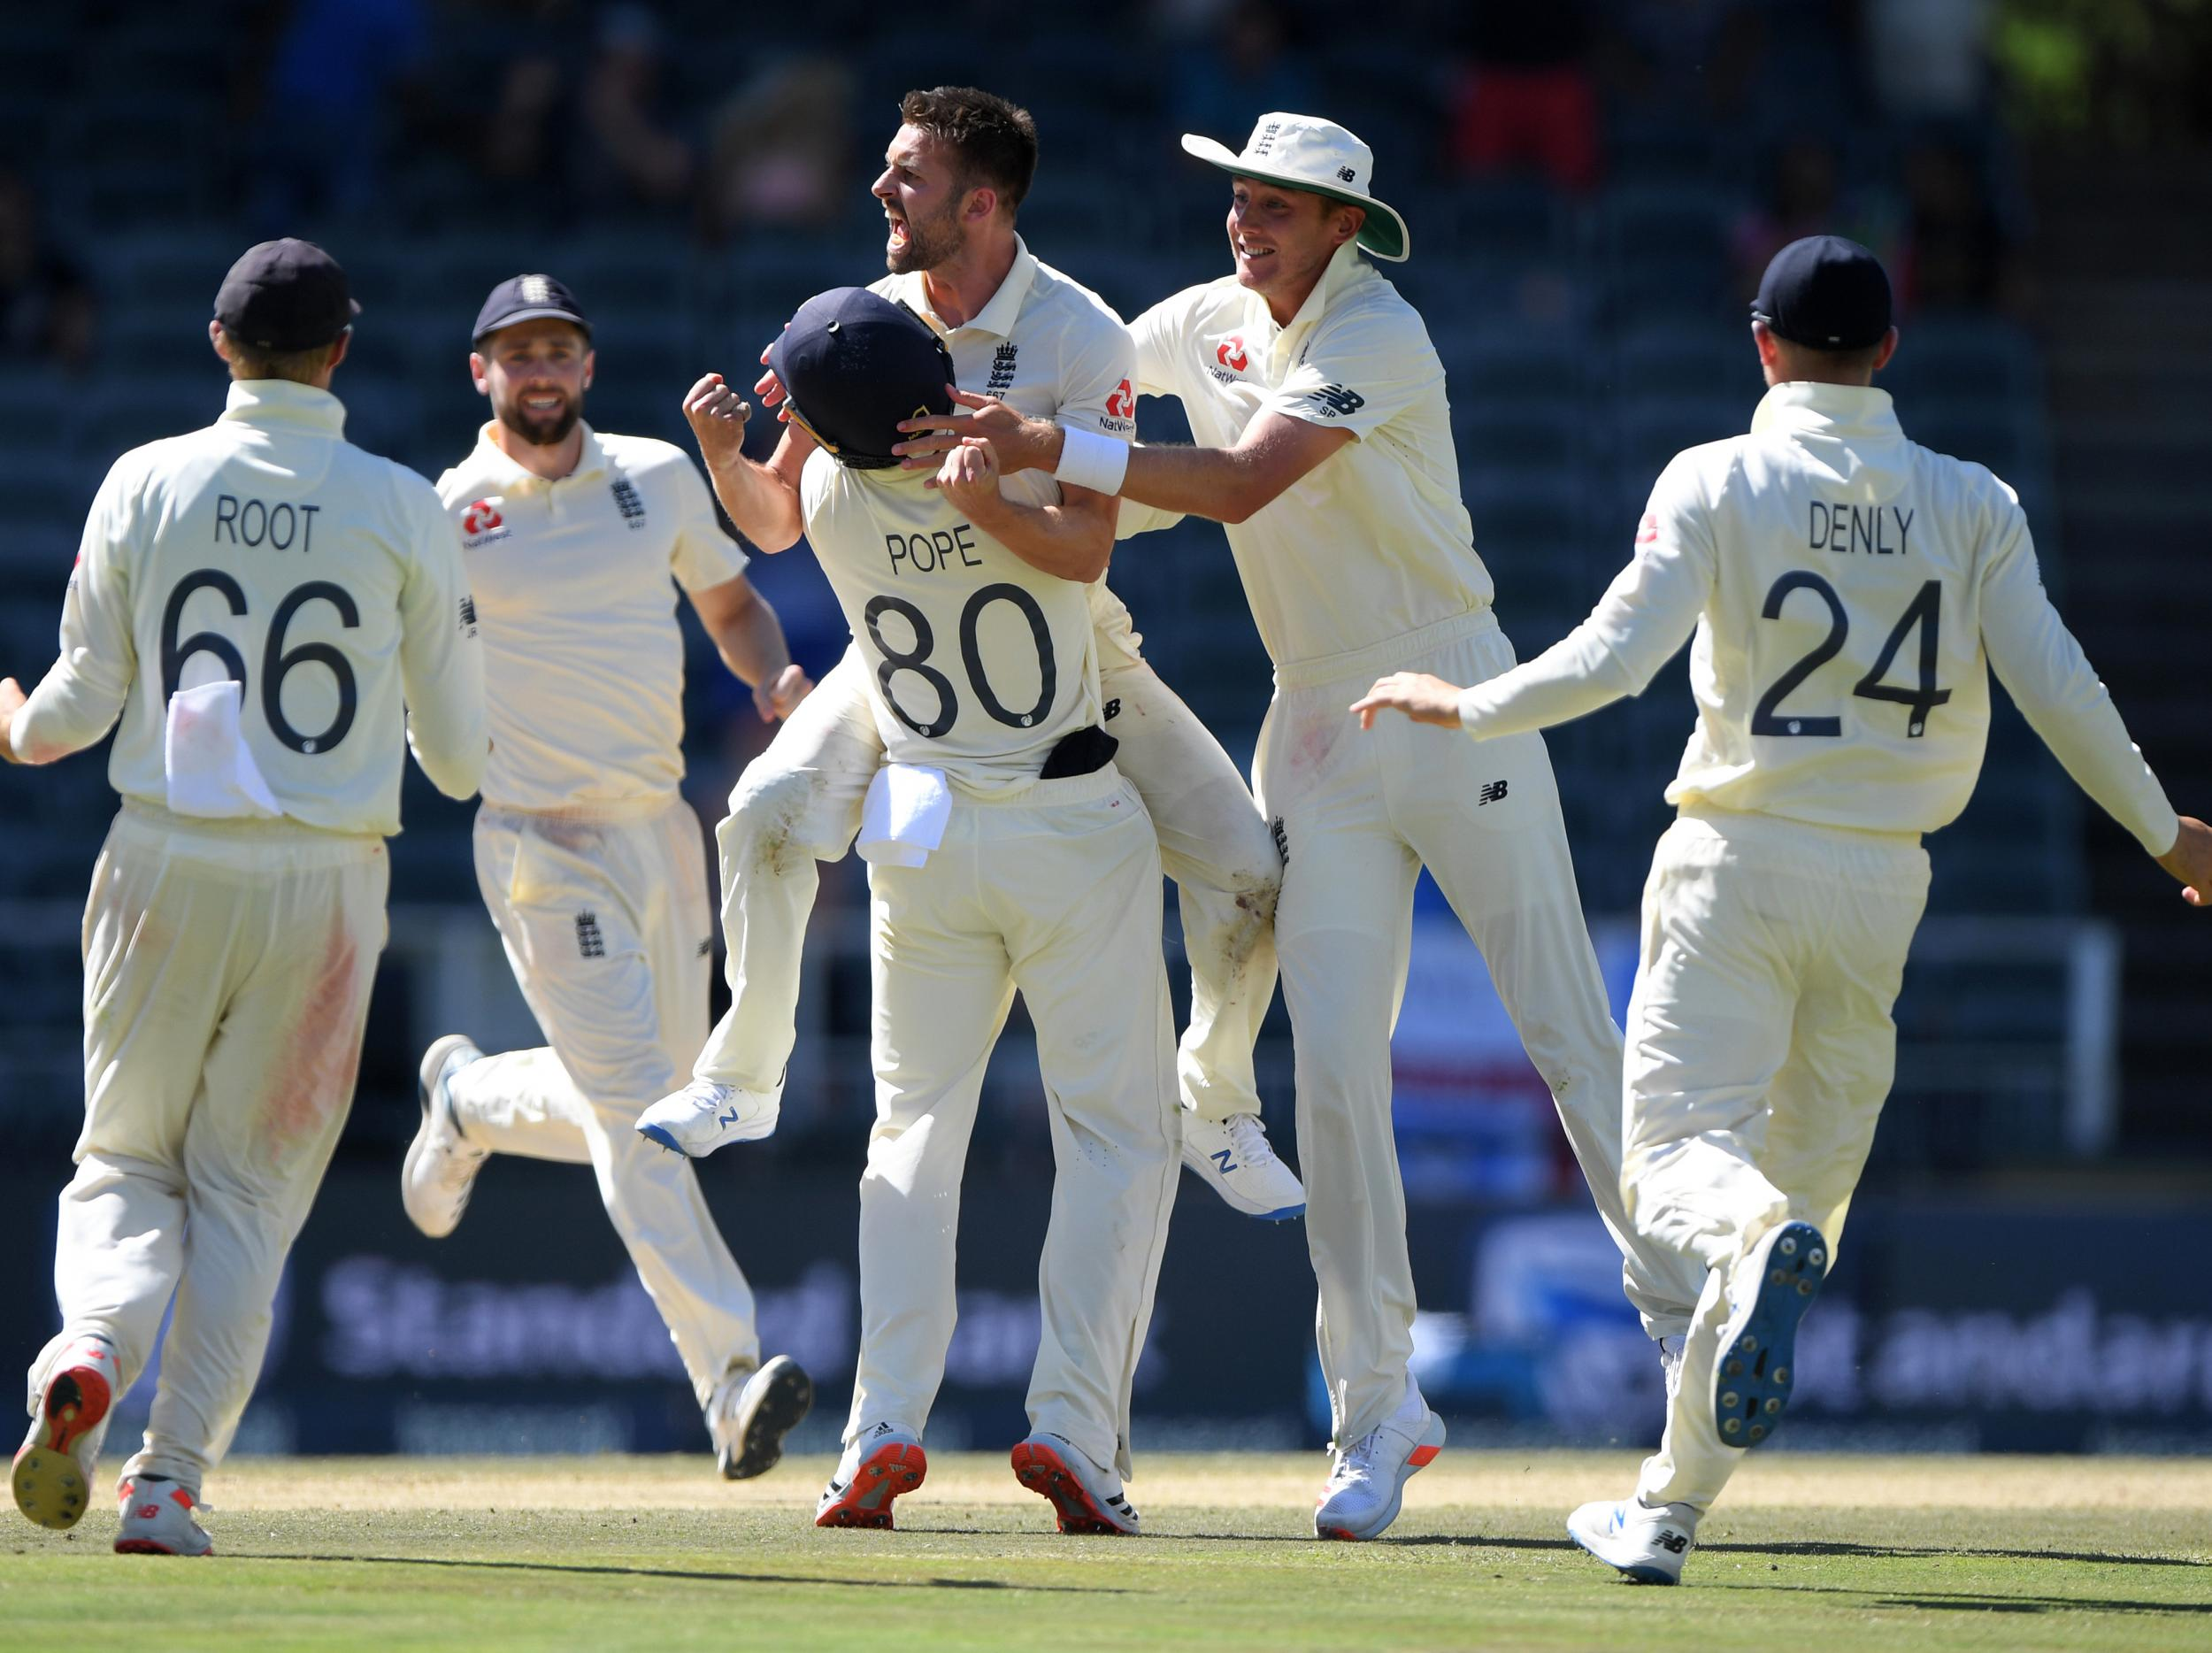 ECB to seek guidance about cricket's return from coronavirus pandemic